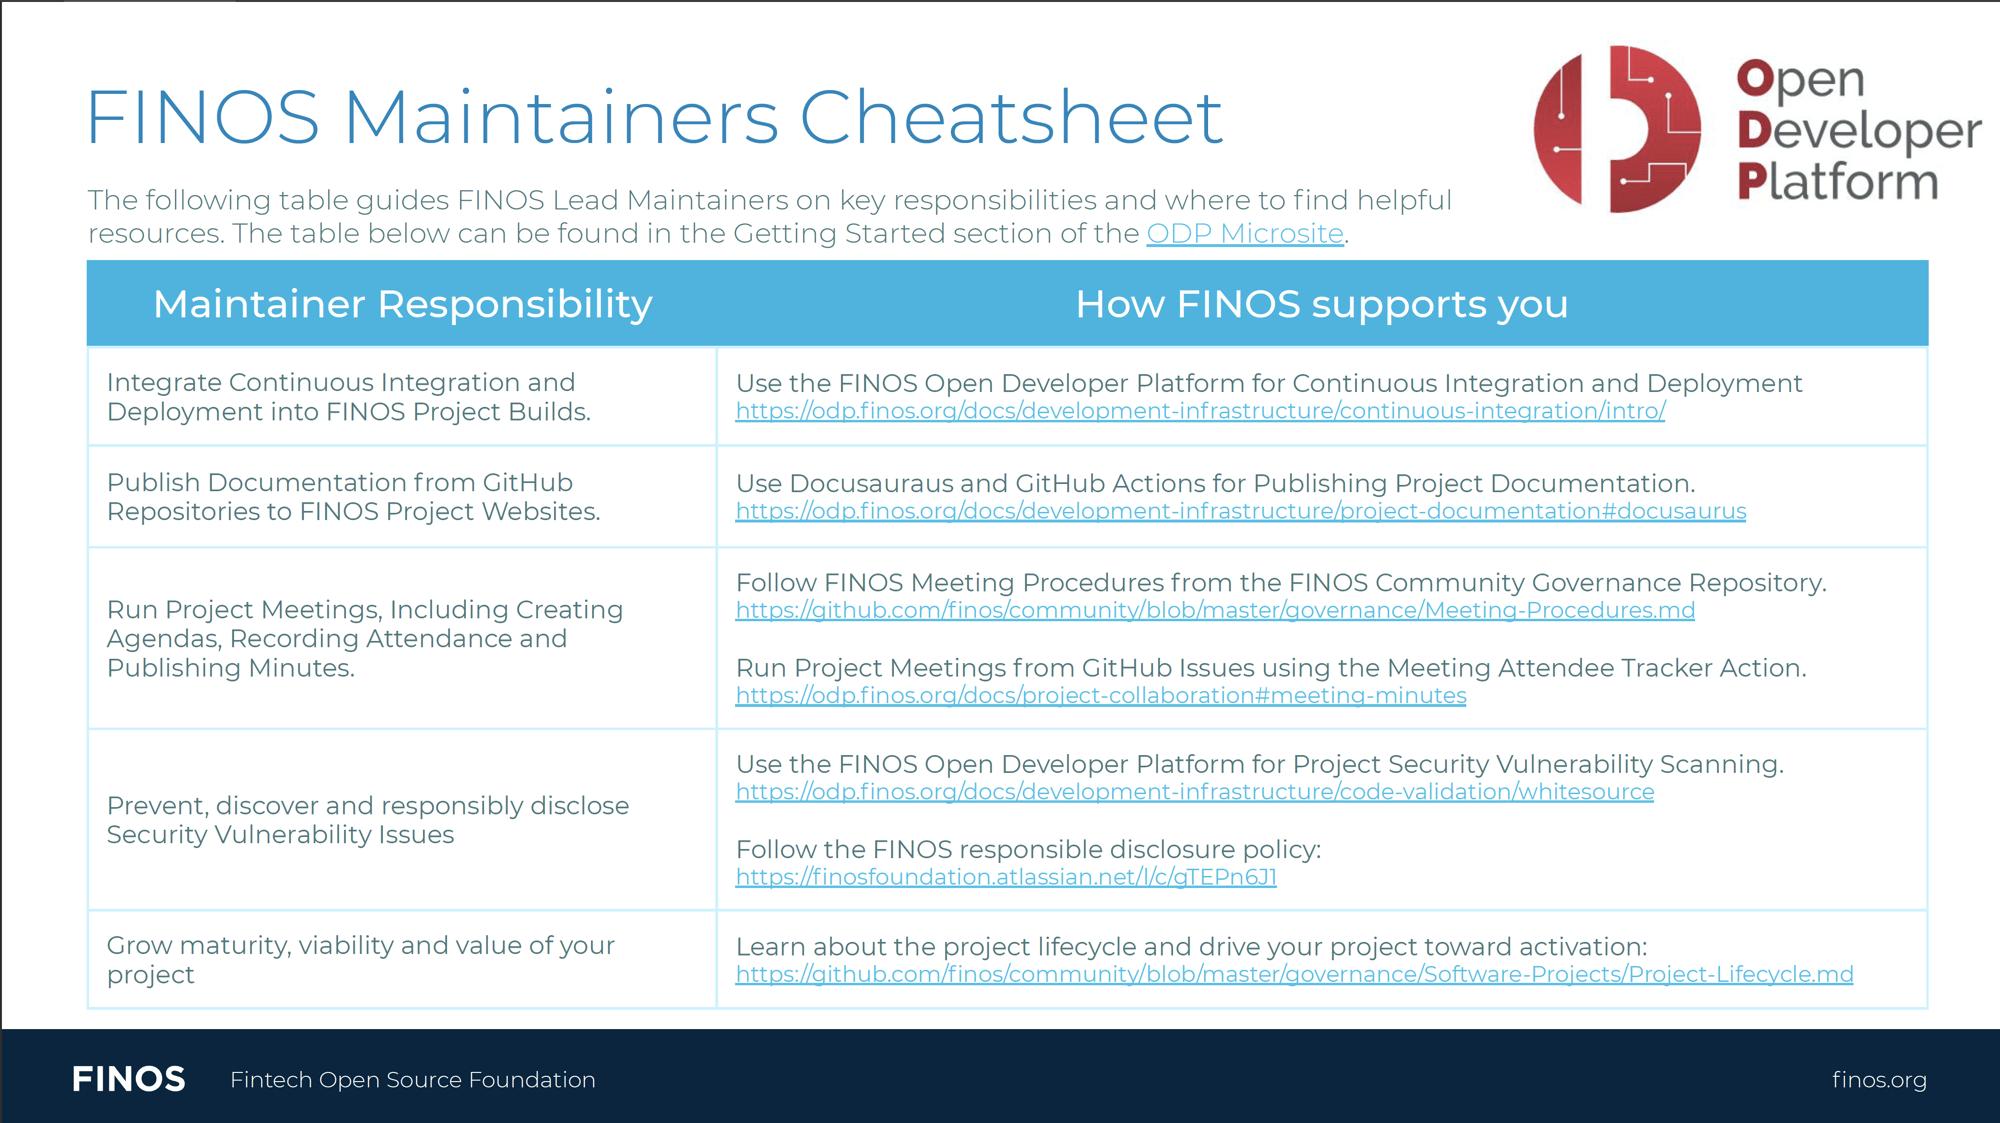 FINOS Maintainers Cheatsheet